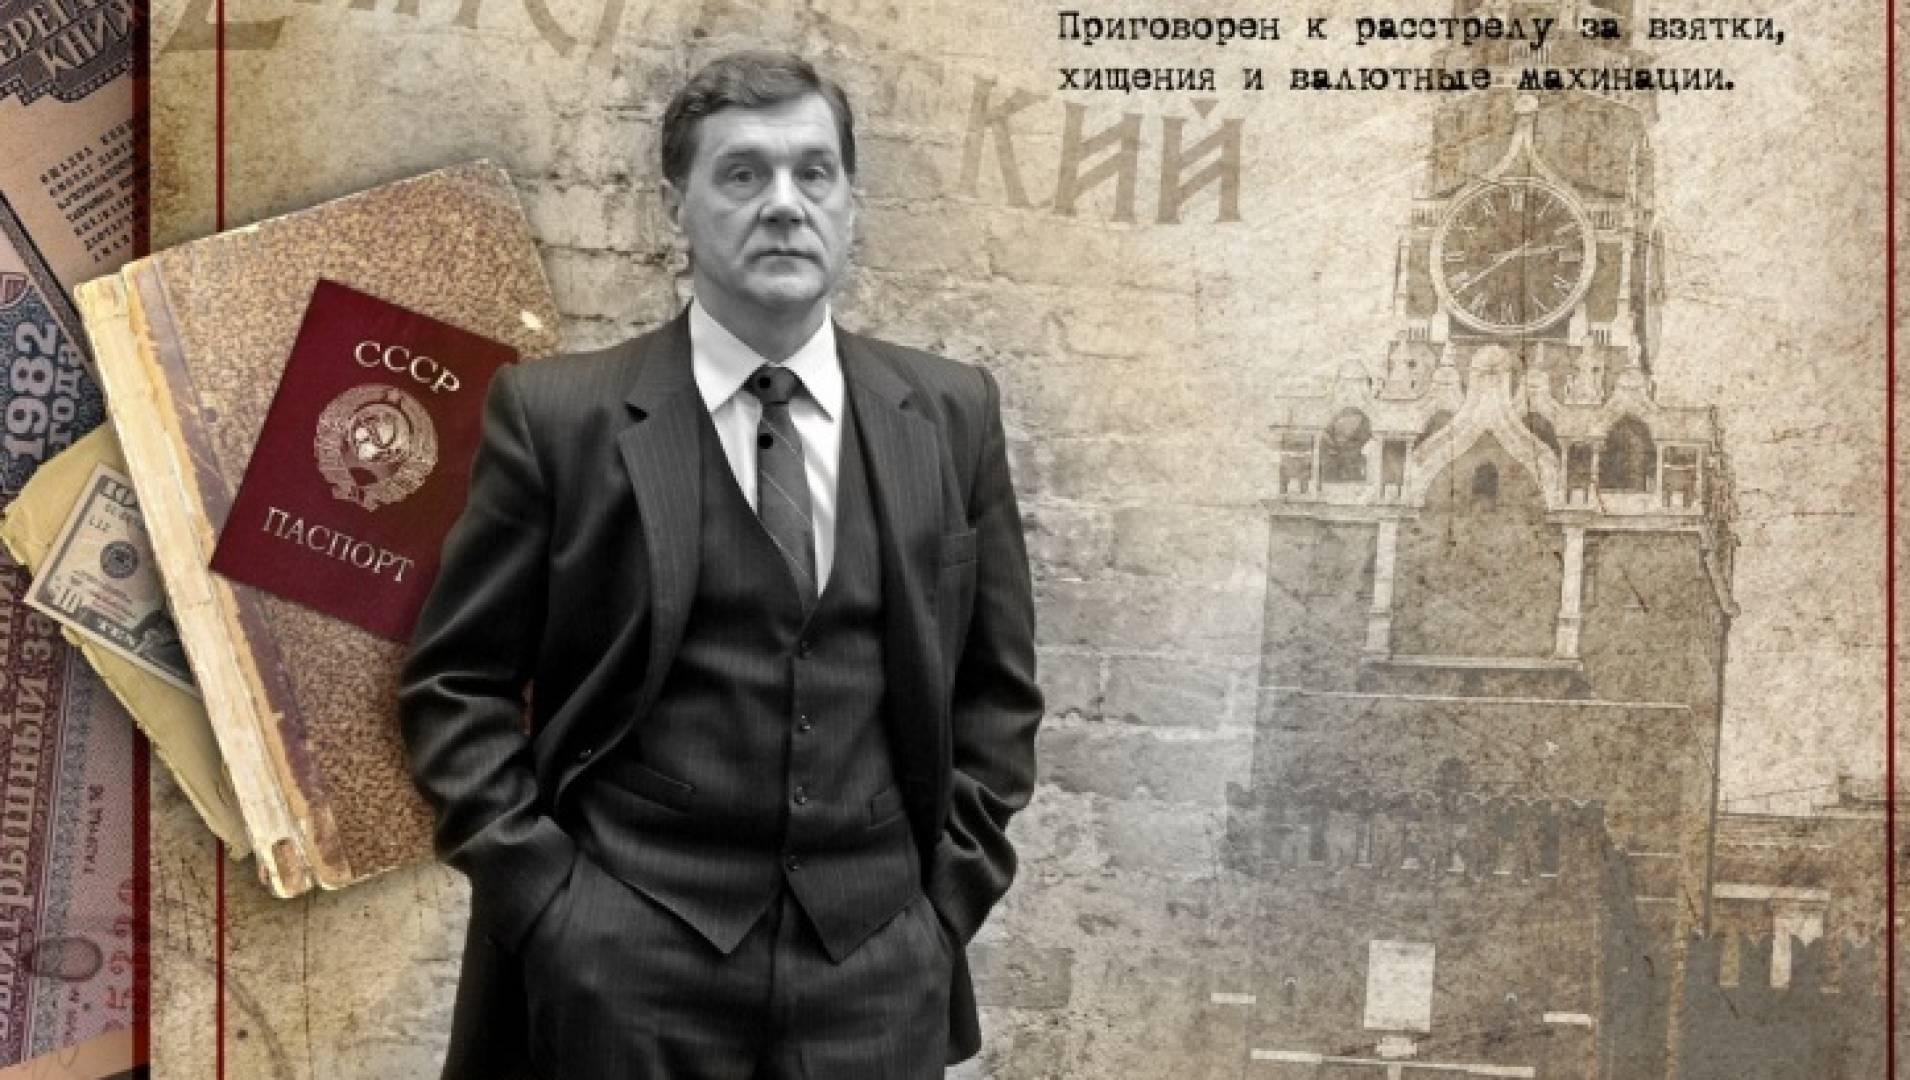 Дело гастронома №1 - Драма, Детектив, Сериал